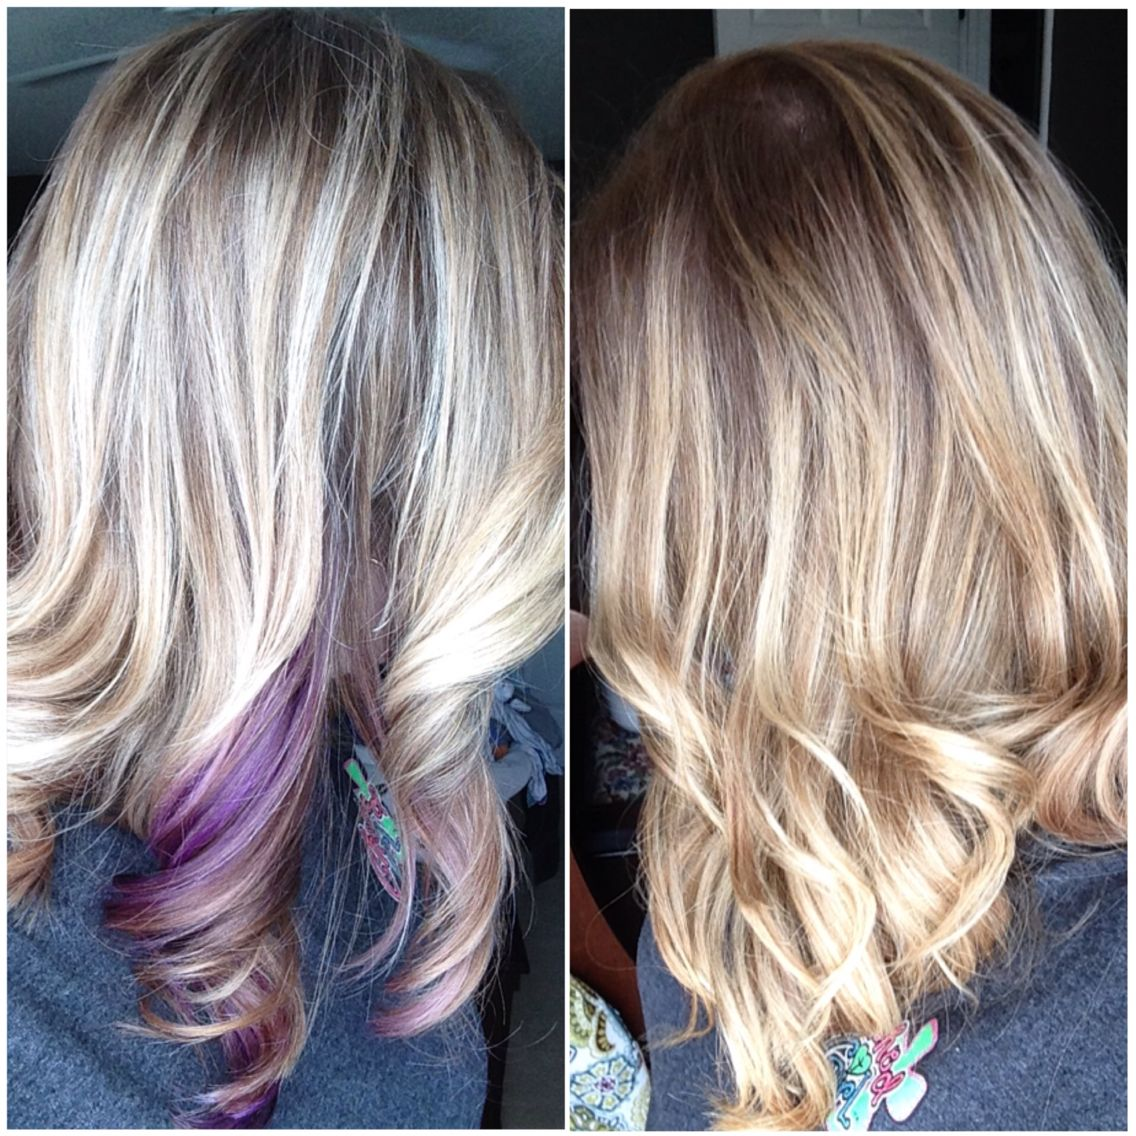 My Hair Blonde Ombre With Purple Peekaboo Hair Hair Inspiration Color Peekaboo Hair